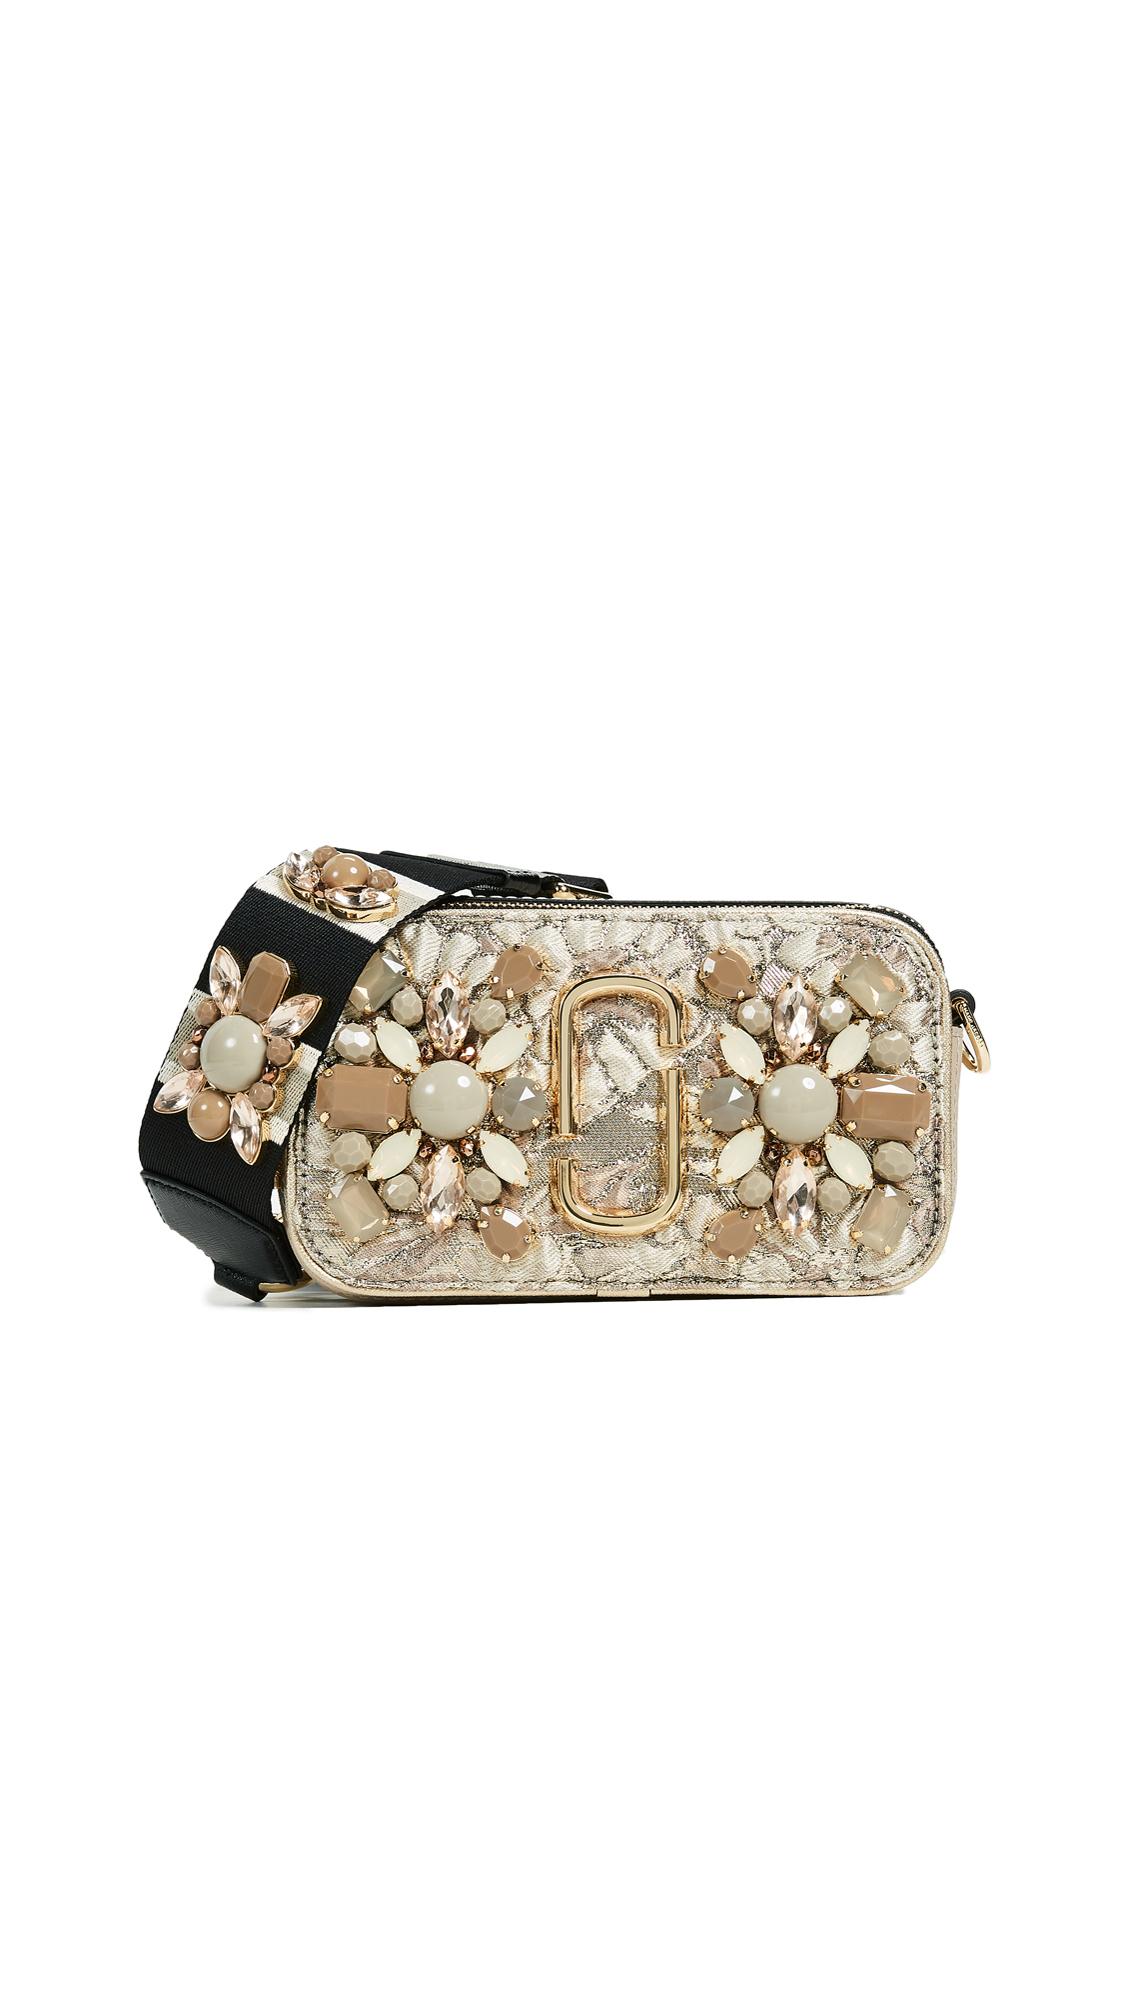 Marc Jacobs Snapshot Camera Bag in Floral Brocade - Beige Multi